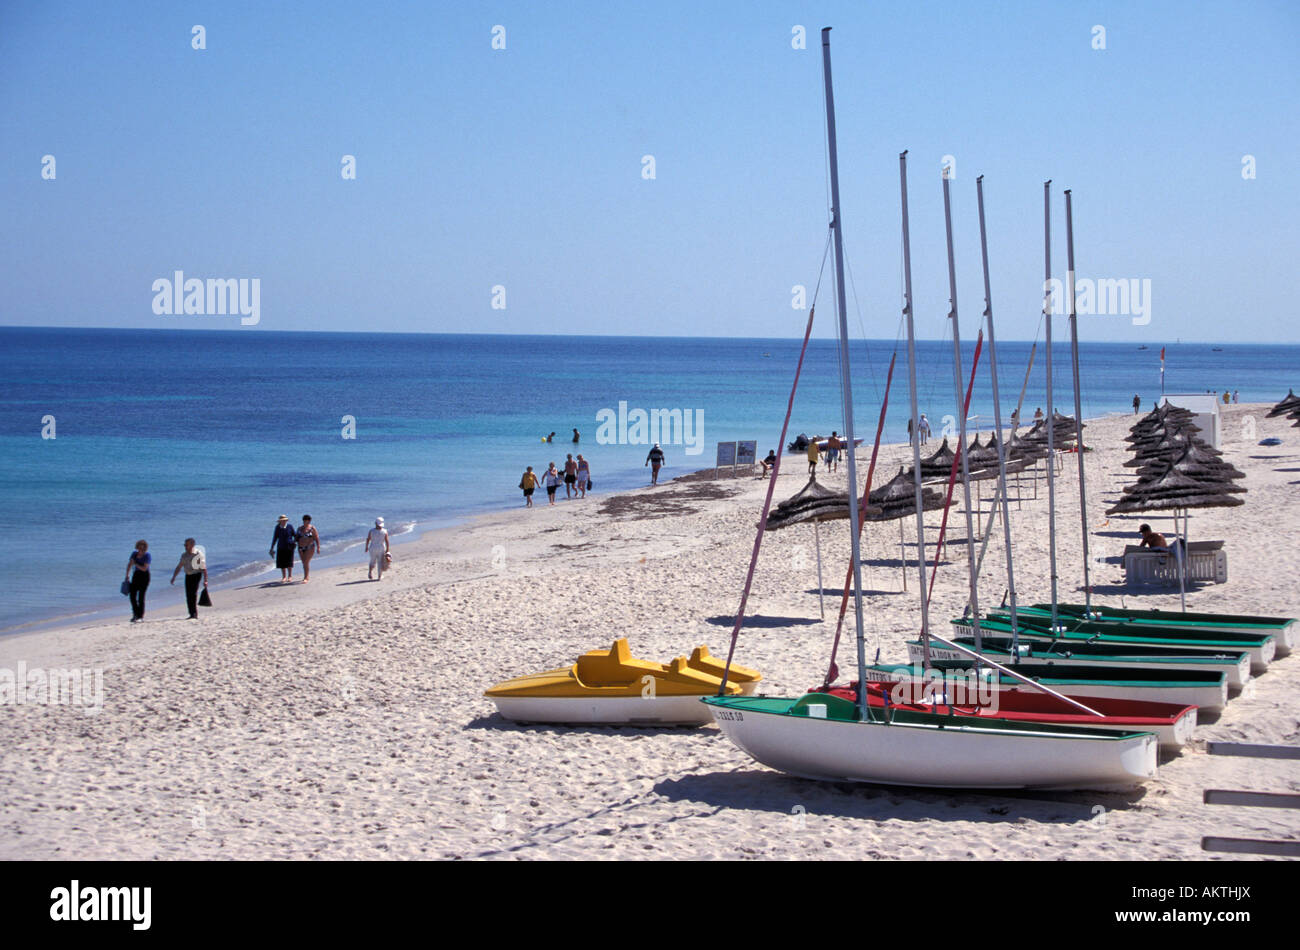 Port el Kantaoui Tunesia - Stock Image